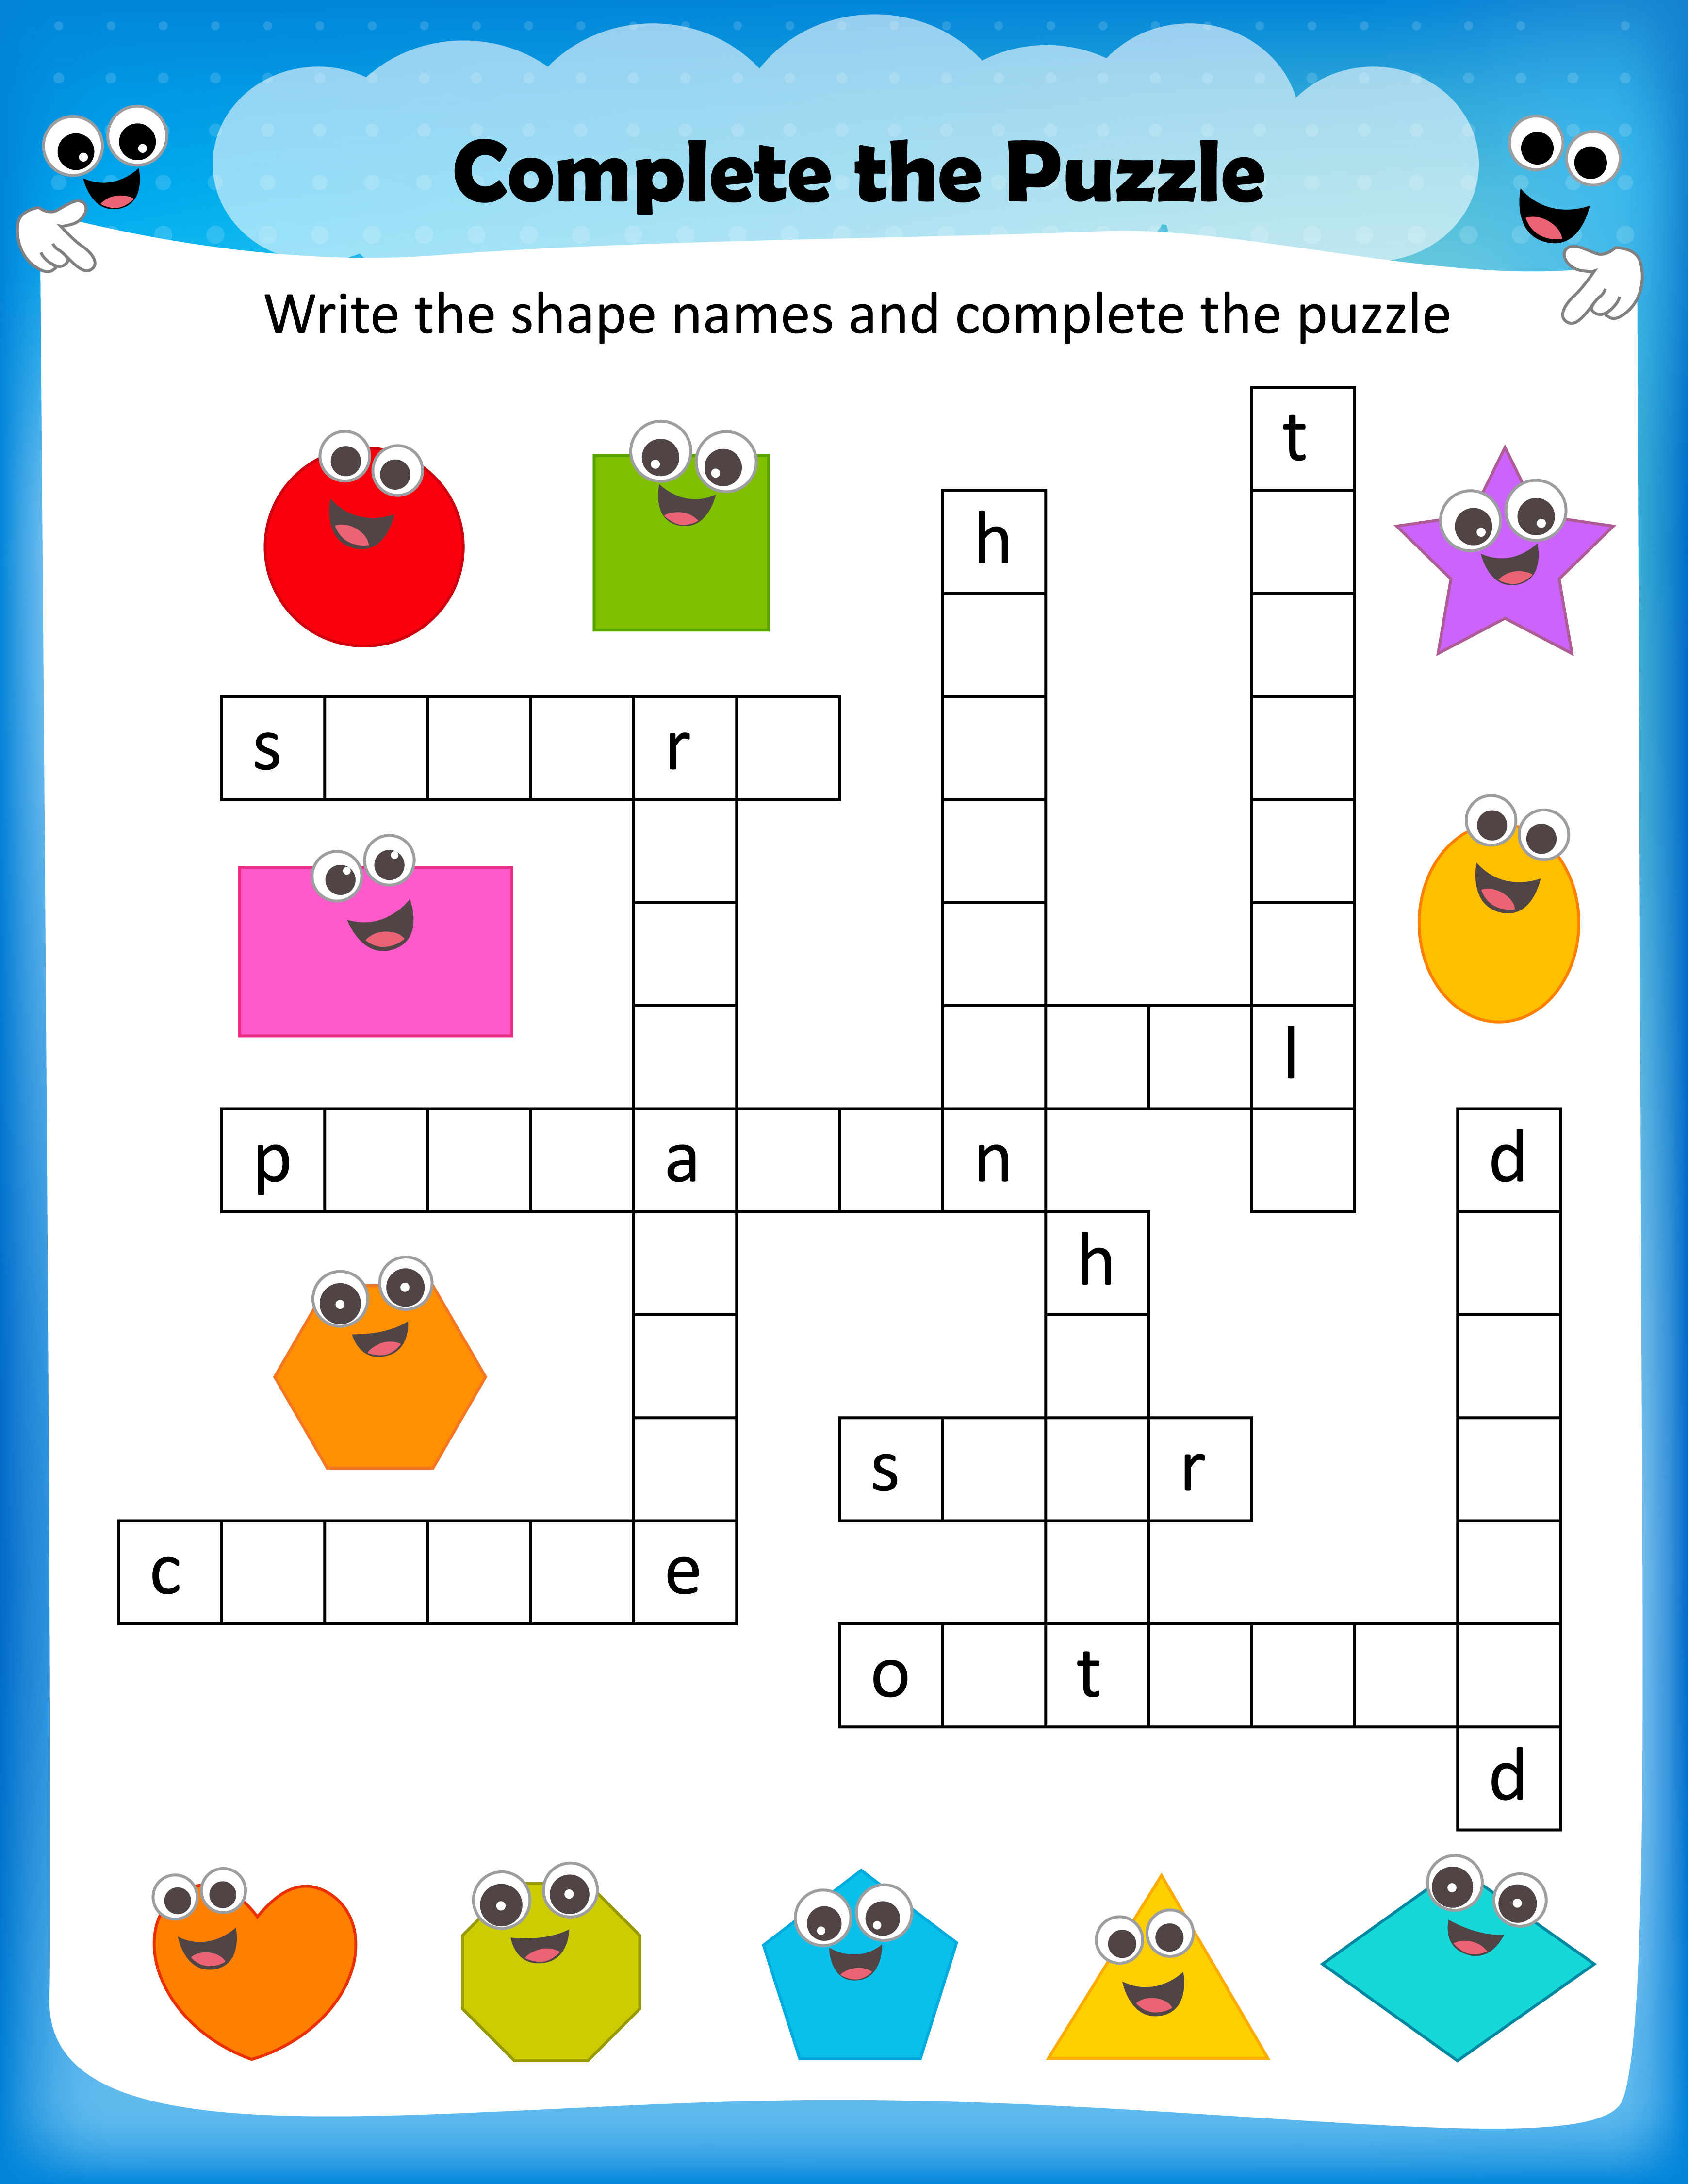 Free Printable Crosswords With Top 10 Benefits For Our Kids - Printable Crossword Puzzles For 5 Year Olds